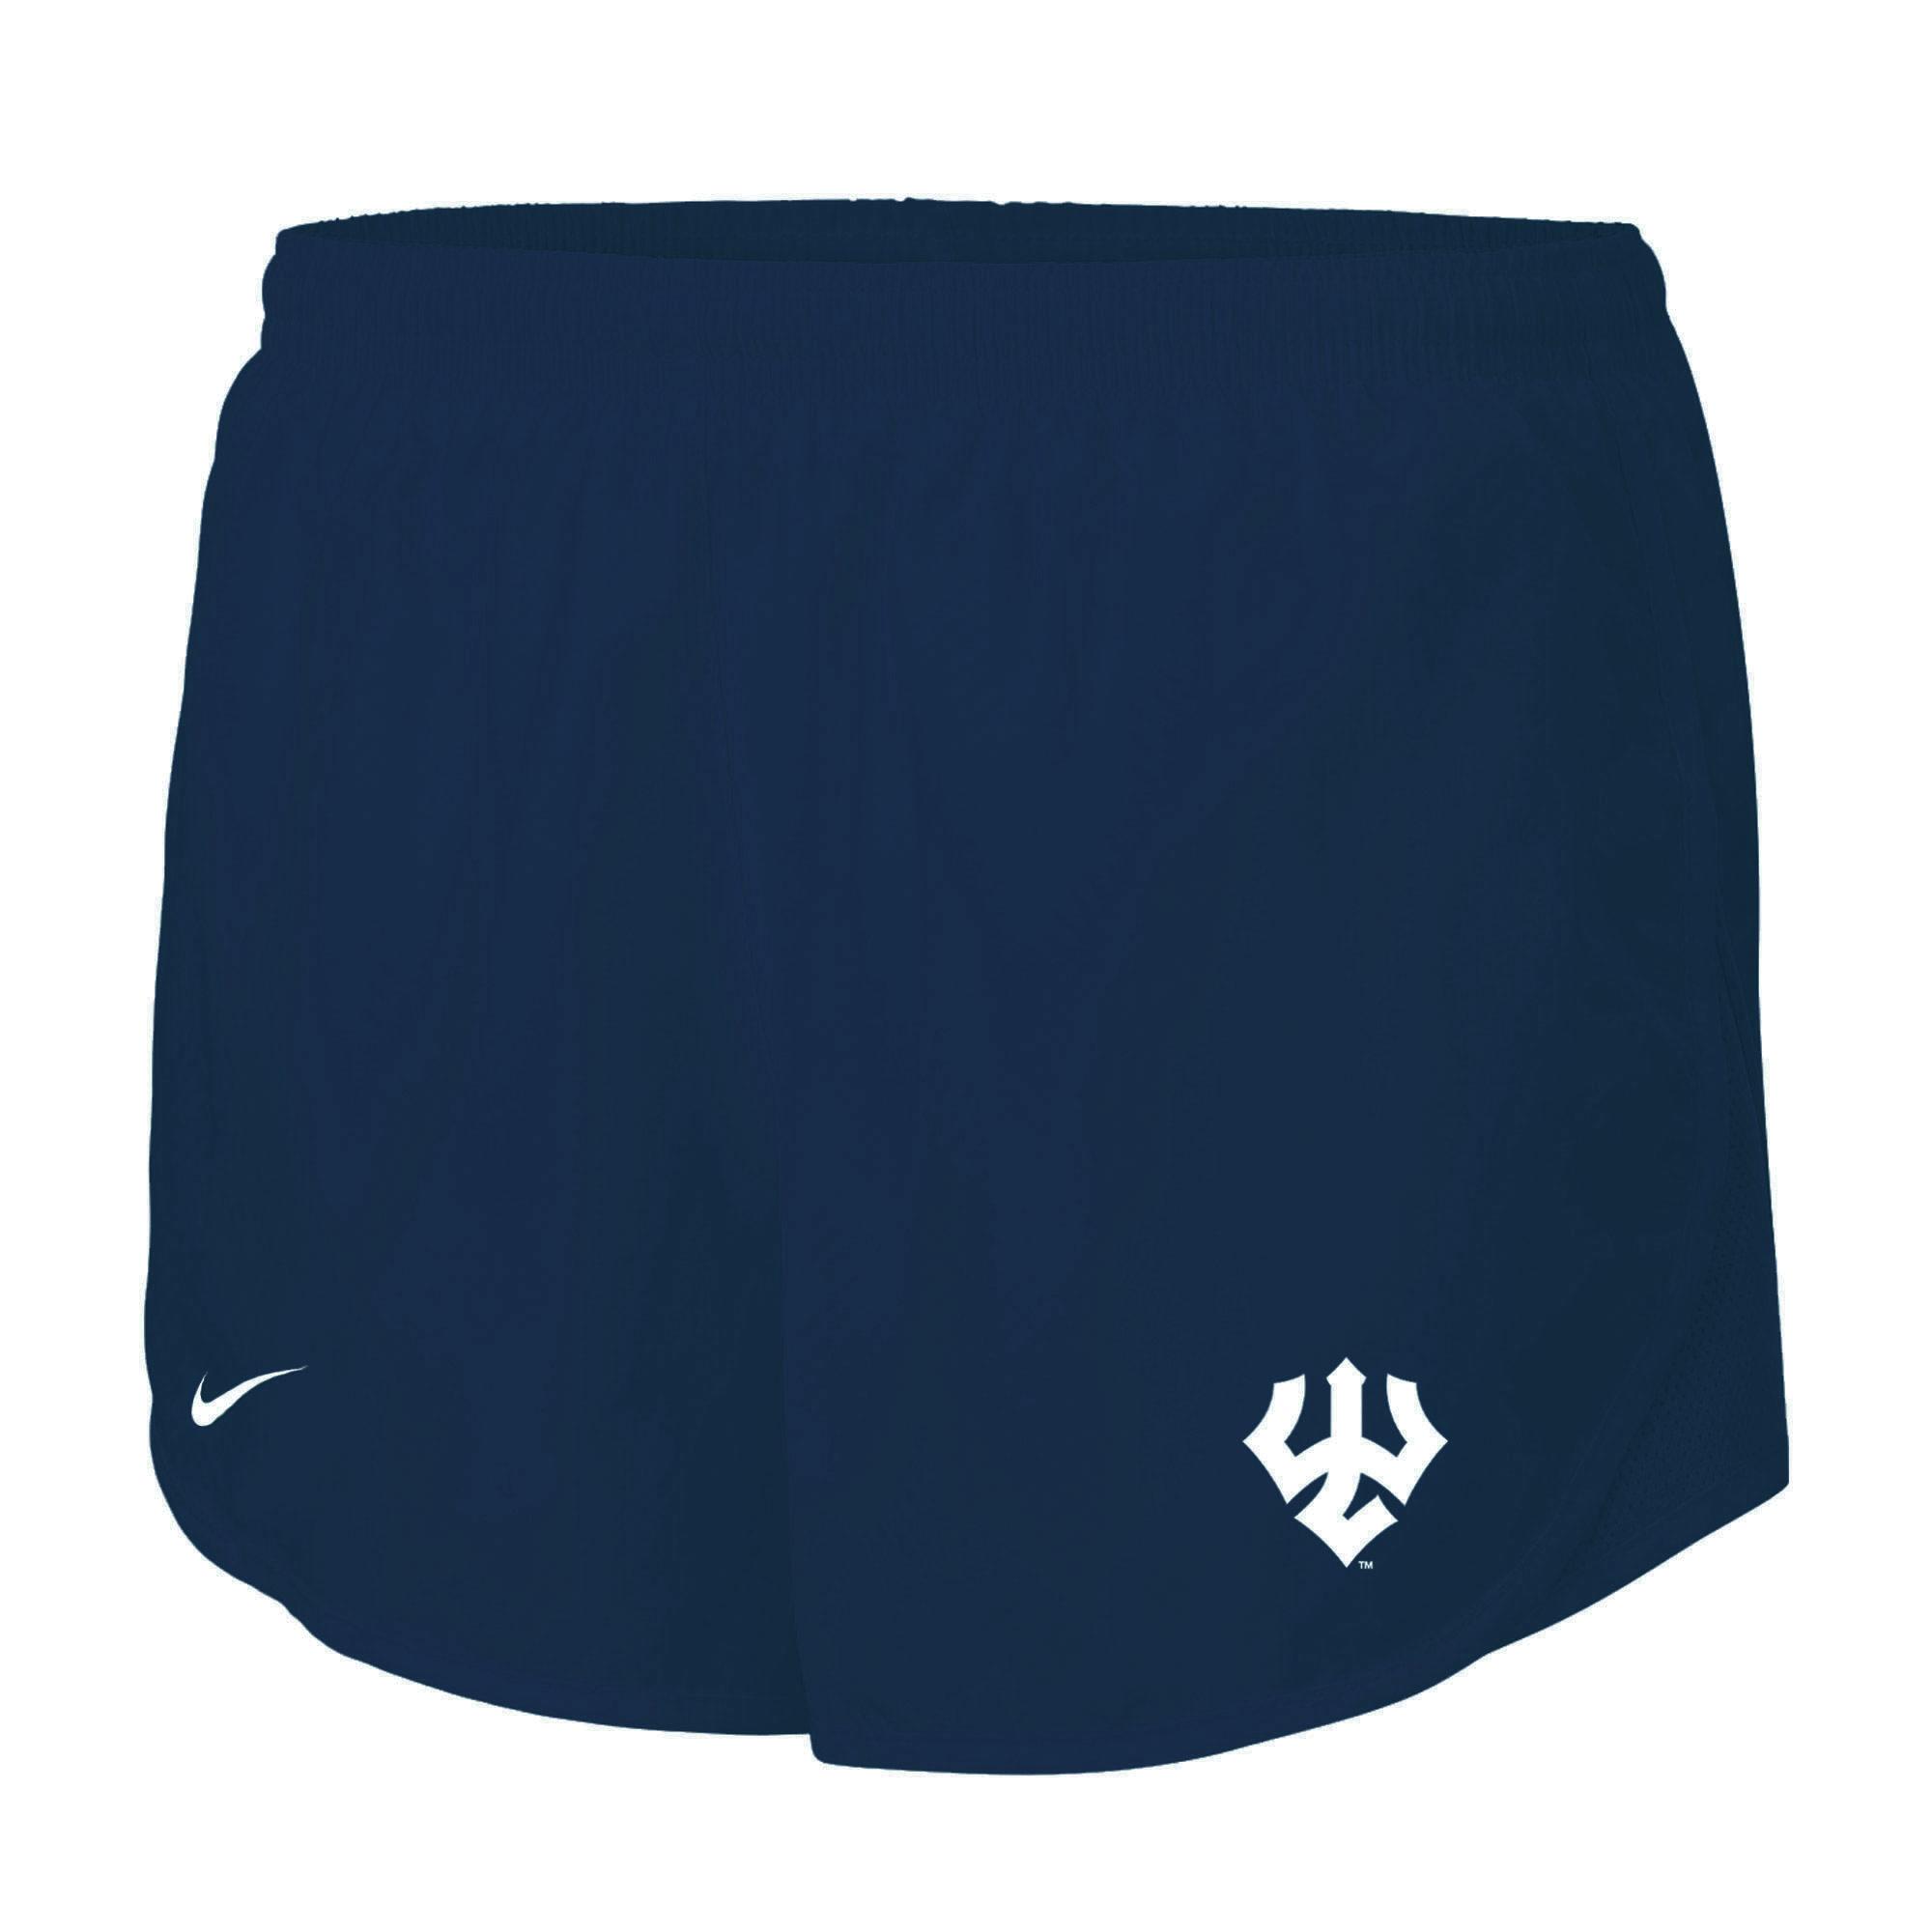 Nike Mod Tempo Short, Navy